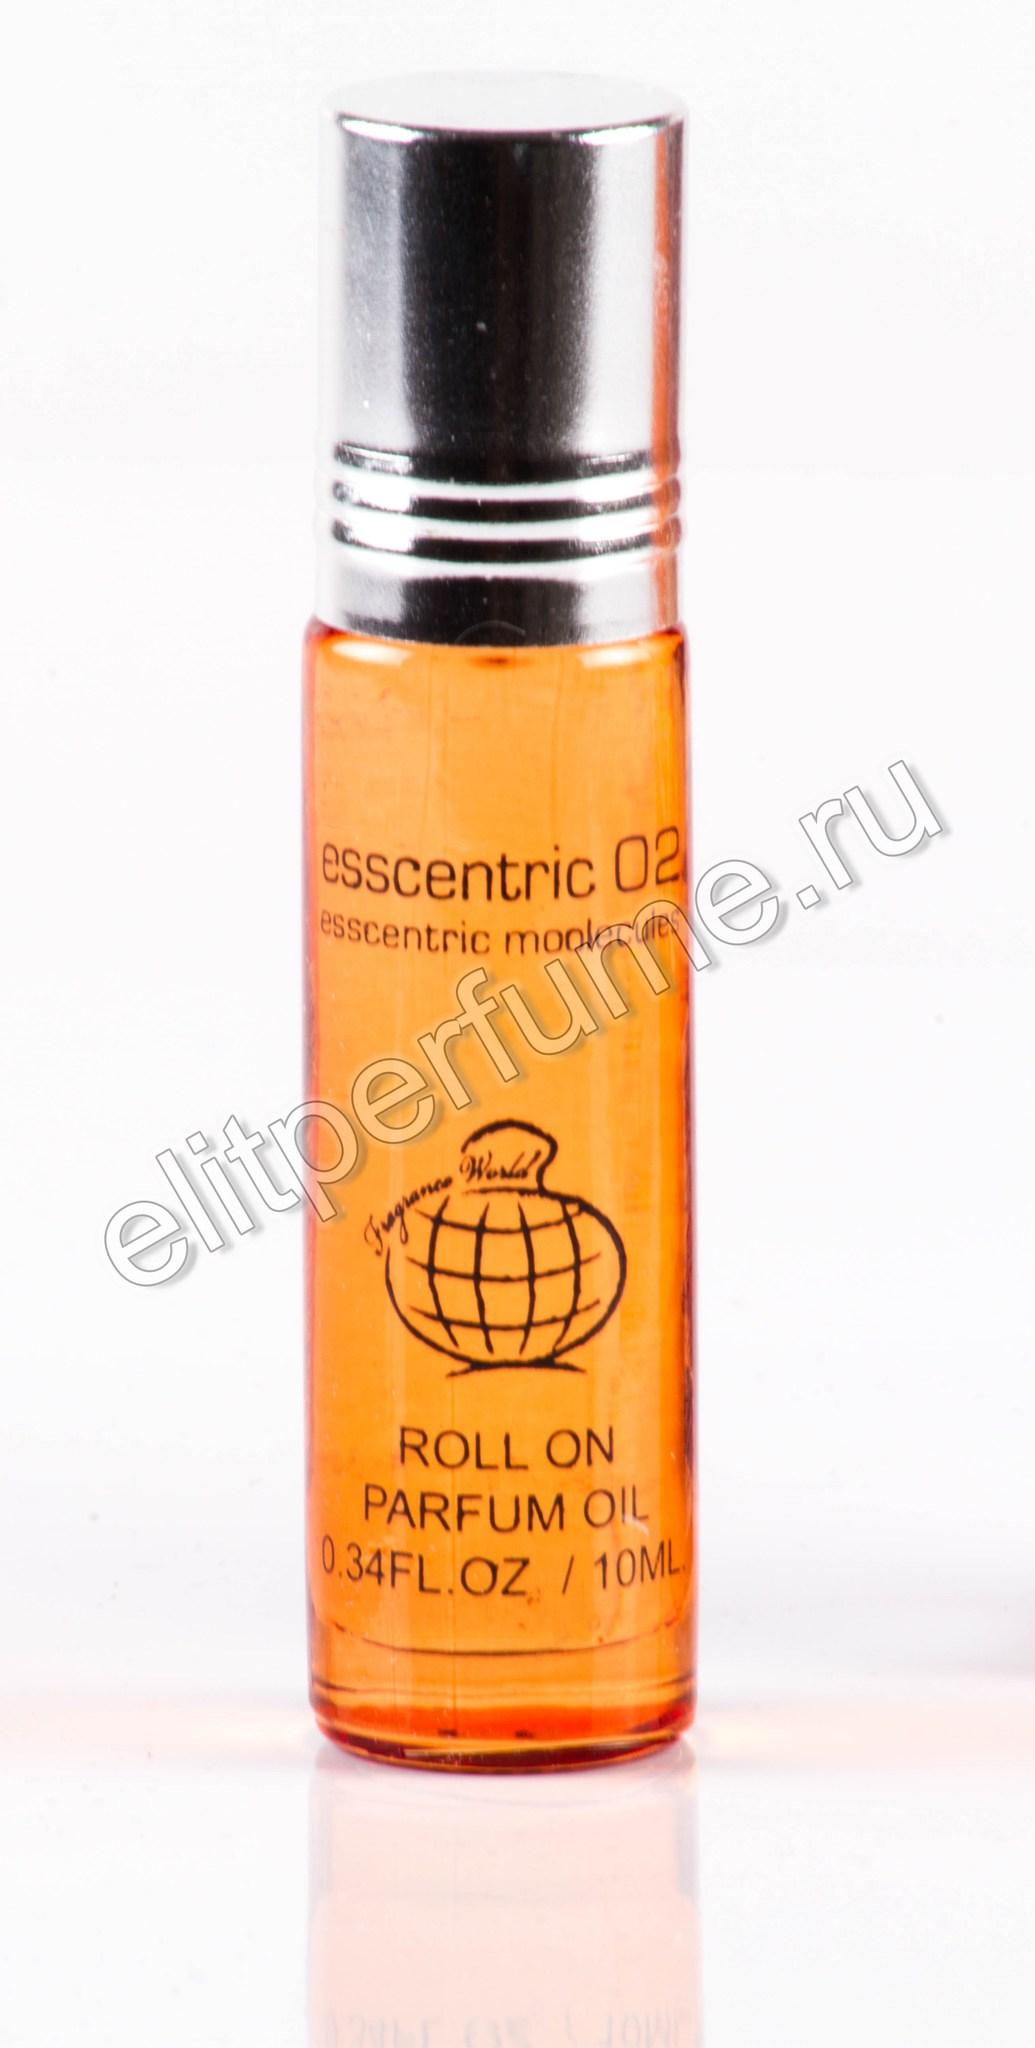 Esscentric 02 10 мл арабские масляные духи от Фрагранс Ворлд Fragrance world